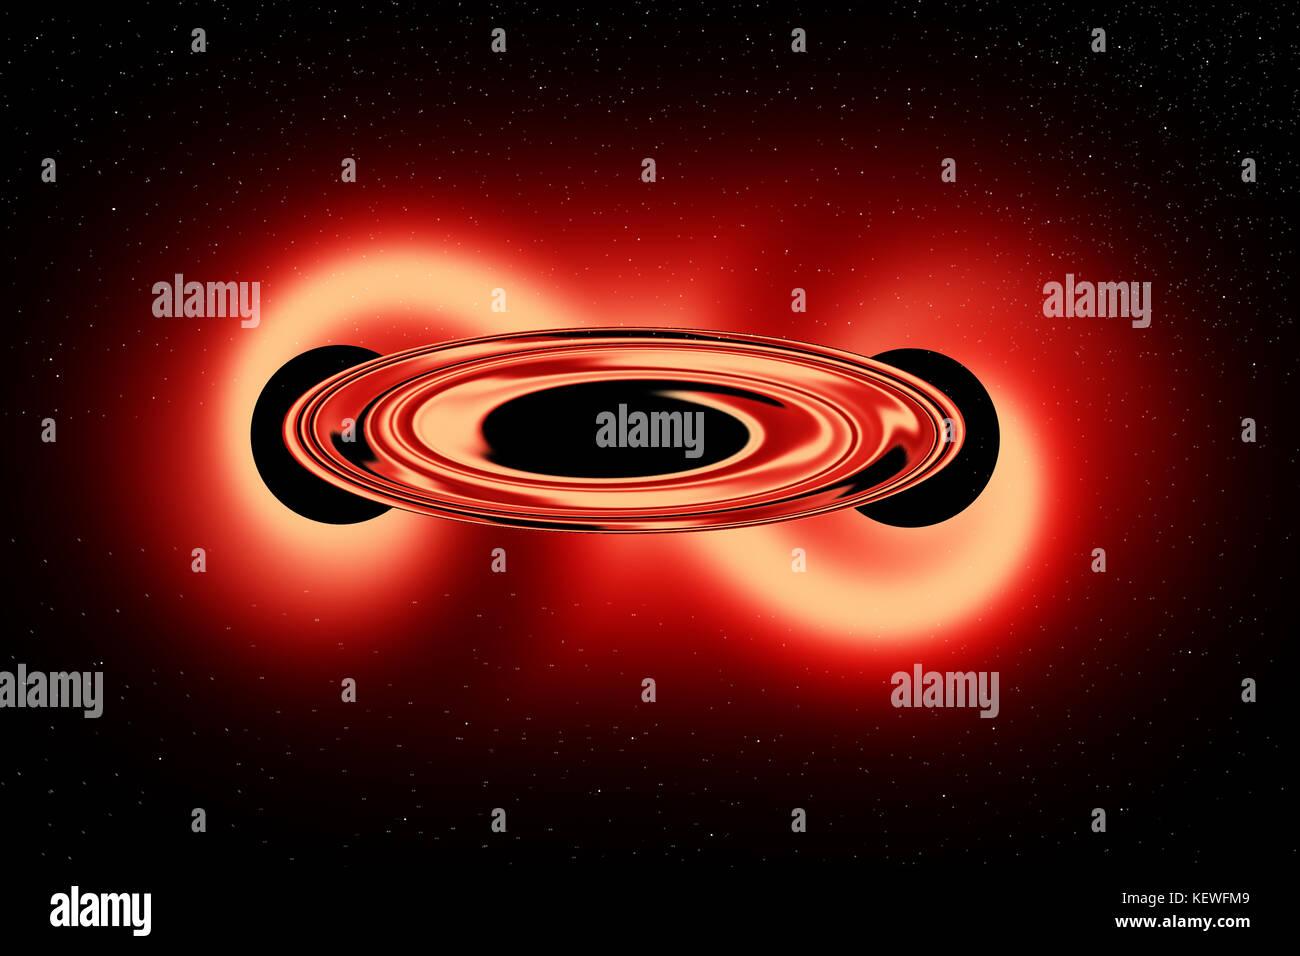 2 Black Holes Merging To Form A Supermassive Black Hole - Stock Image